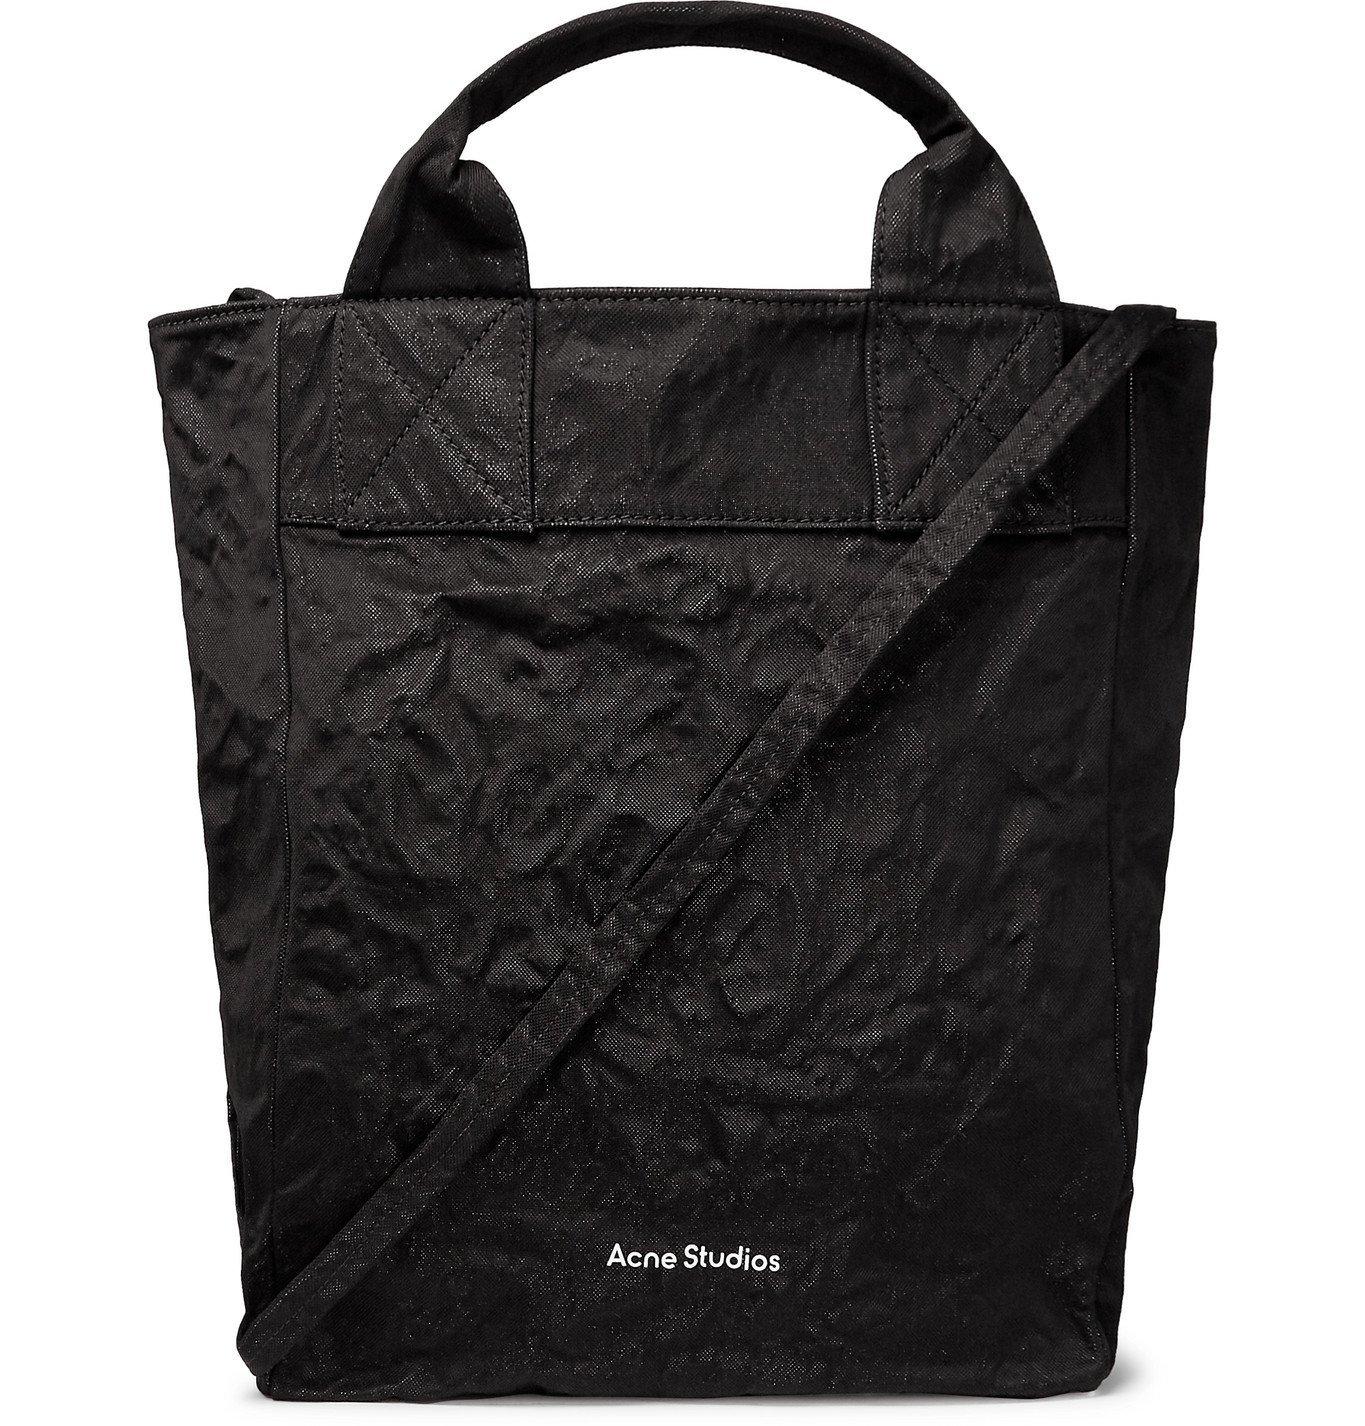 Acne Studios - Crinkled Cotton and Nylon-Blend Tote Bag - Black